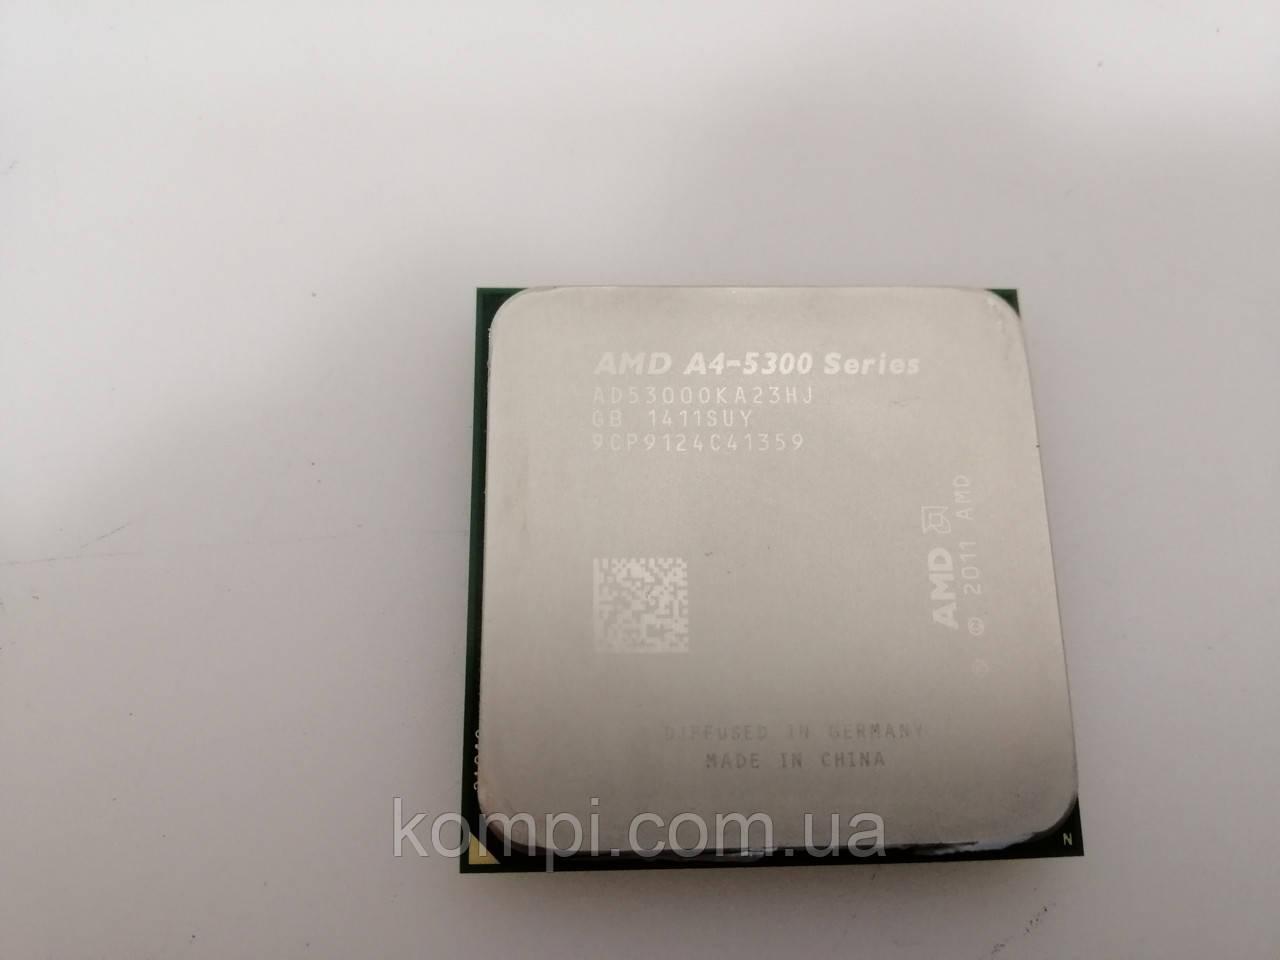 Процессор AMD A4-5300K, 2 ядра 3.4ГГц, FM2